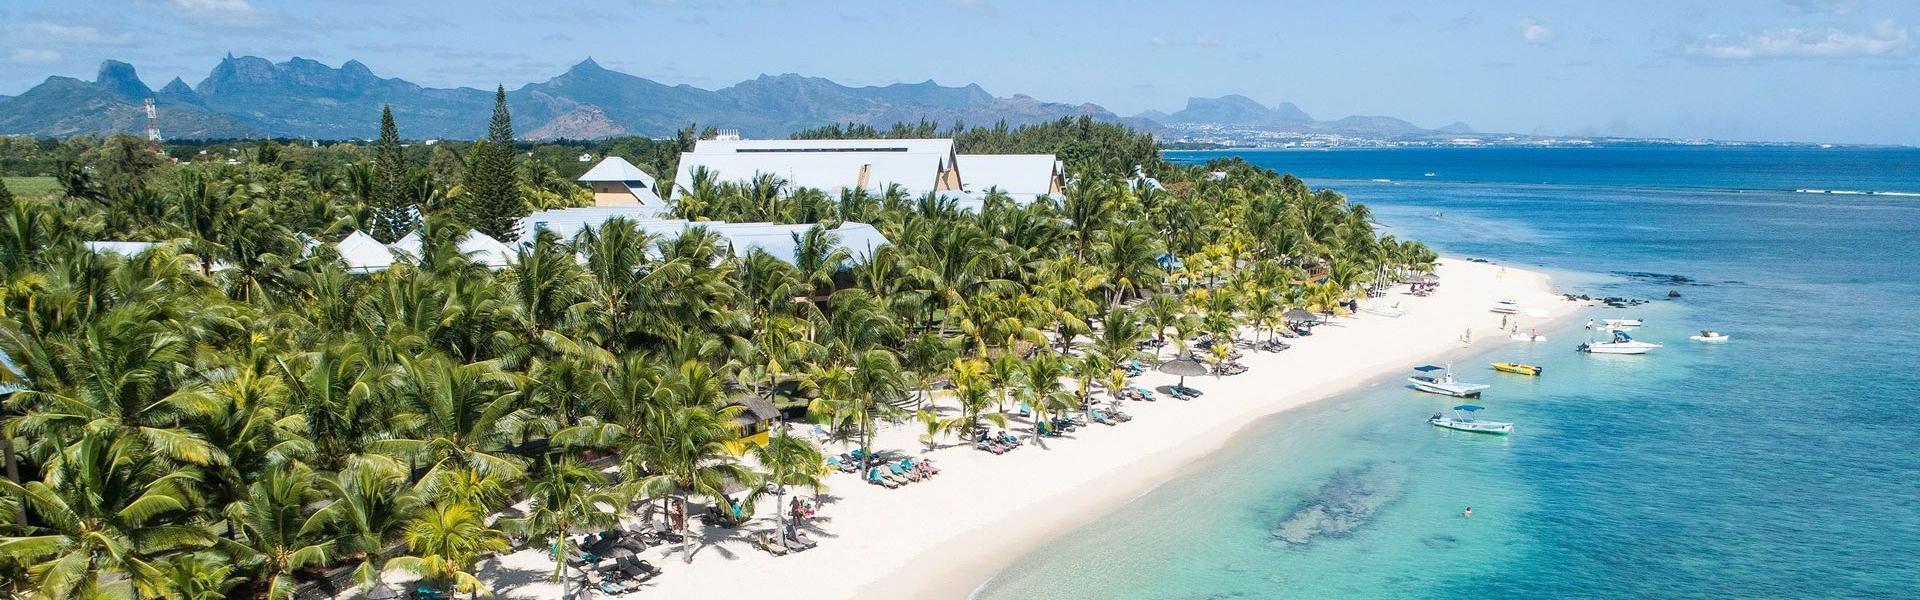 Victoria Beachcomber Resort & Spa (Mauritiusi utazások)